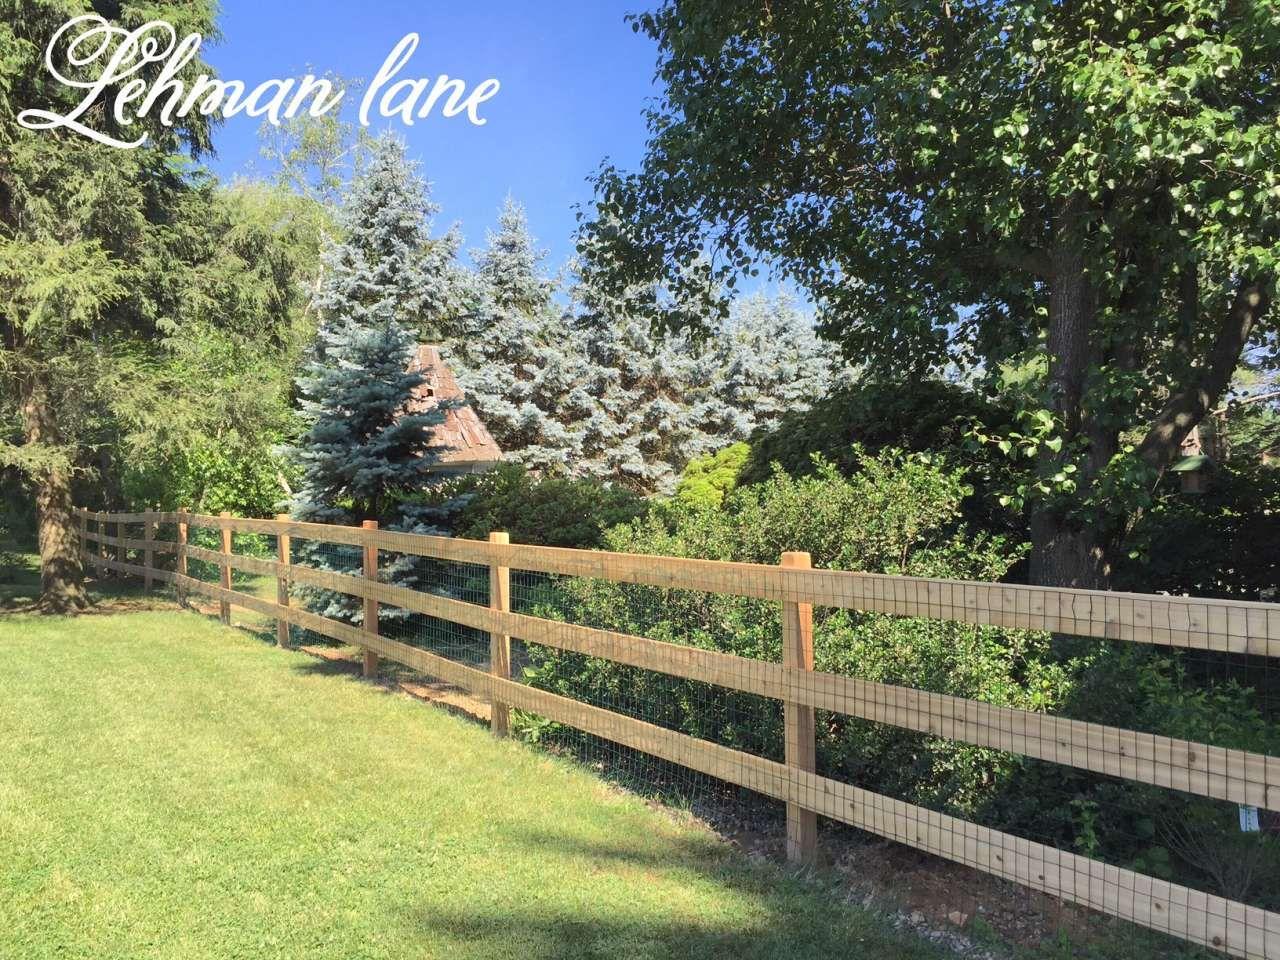 Cedar Post And Rail Fence: Moose Containment - Lehman Lane